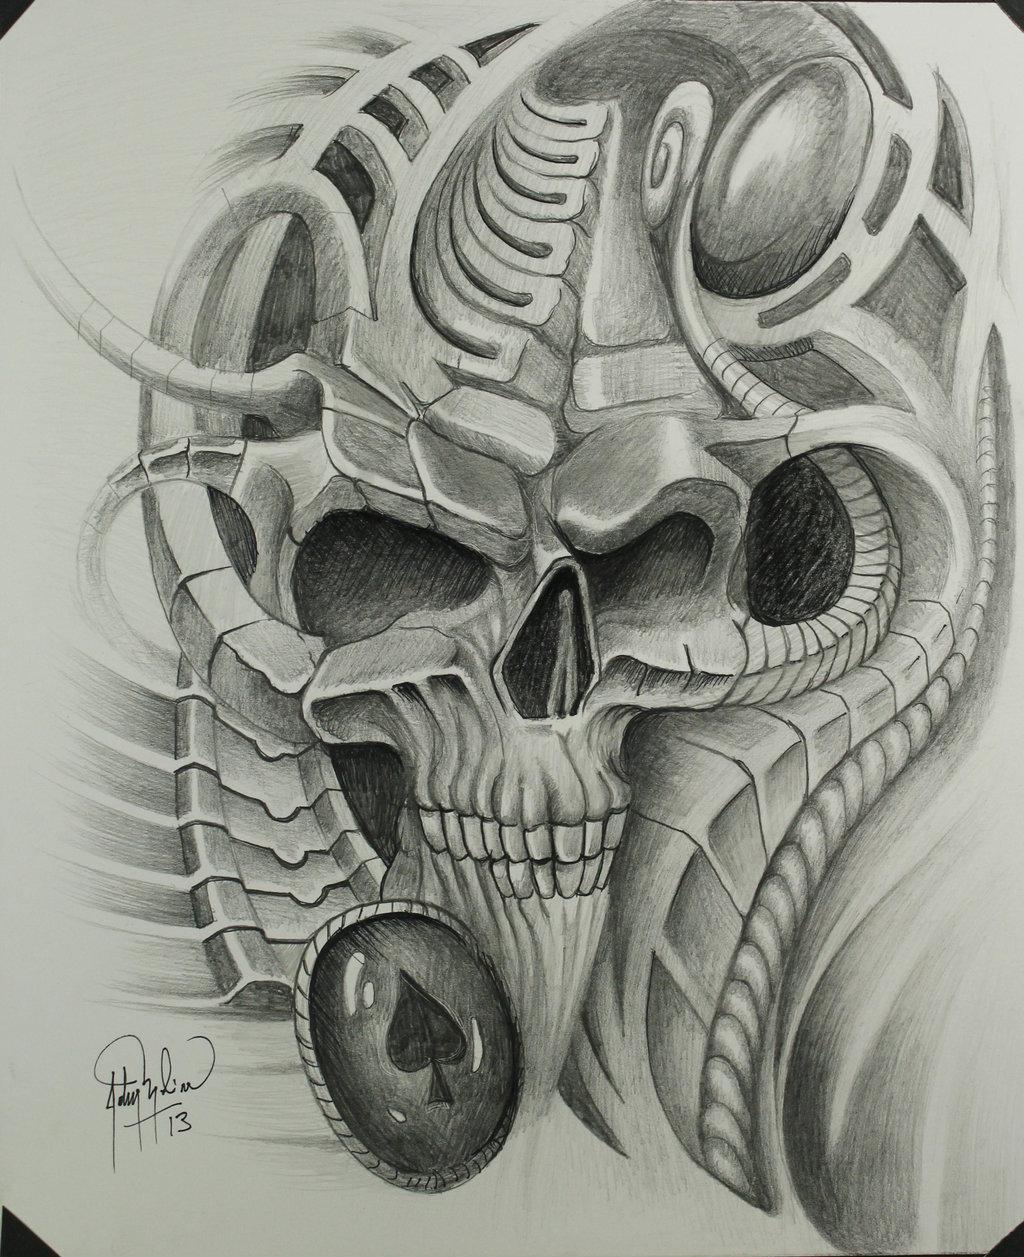 тату эскизы рисунки биомеханика стиль варадеро